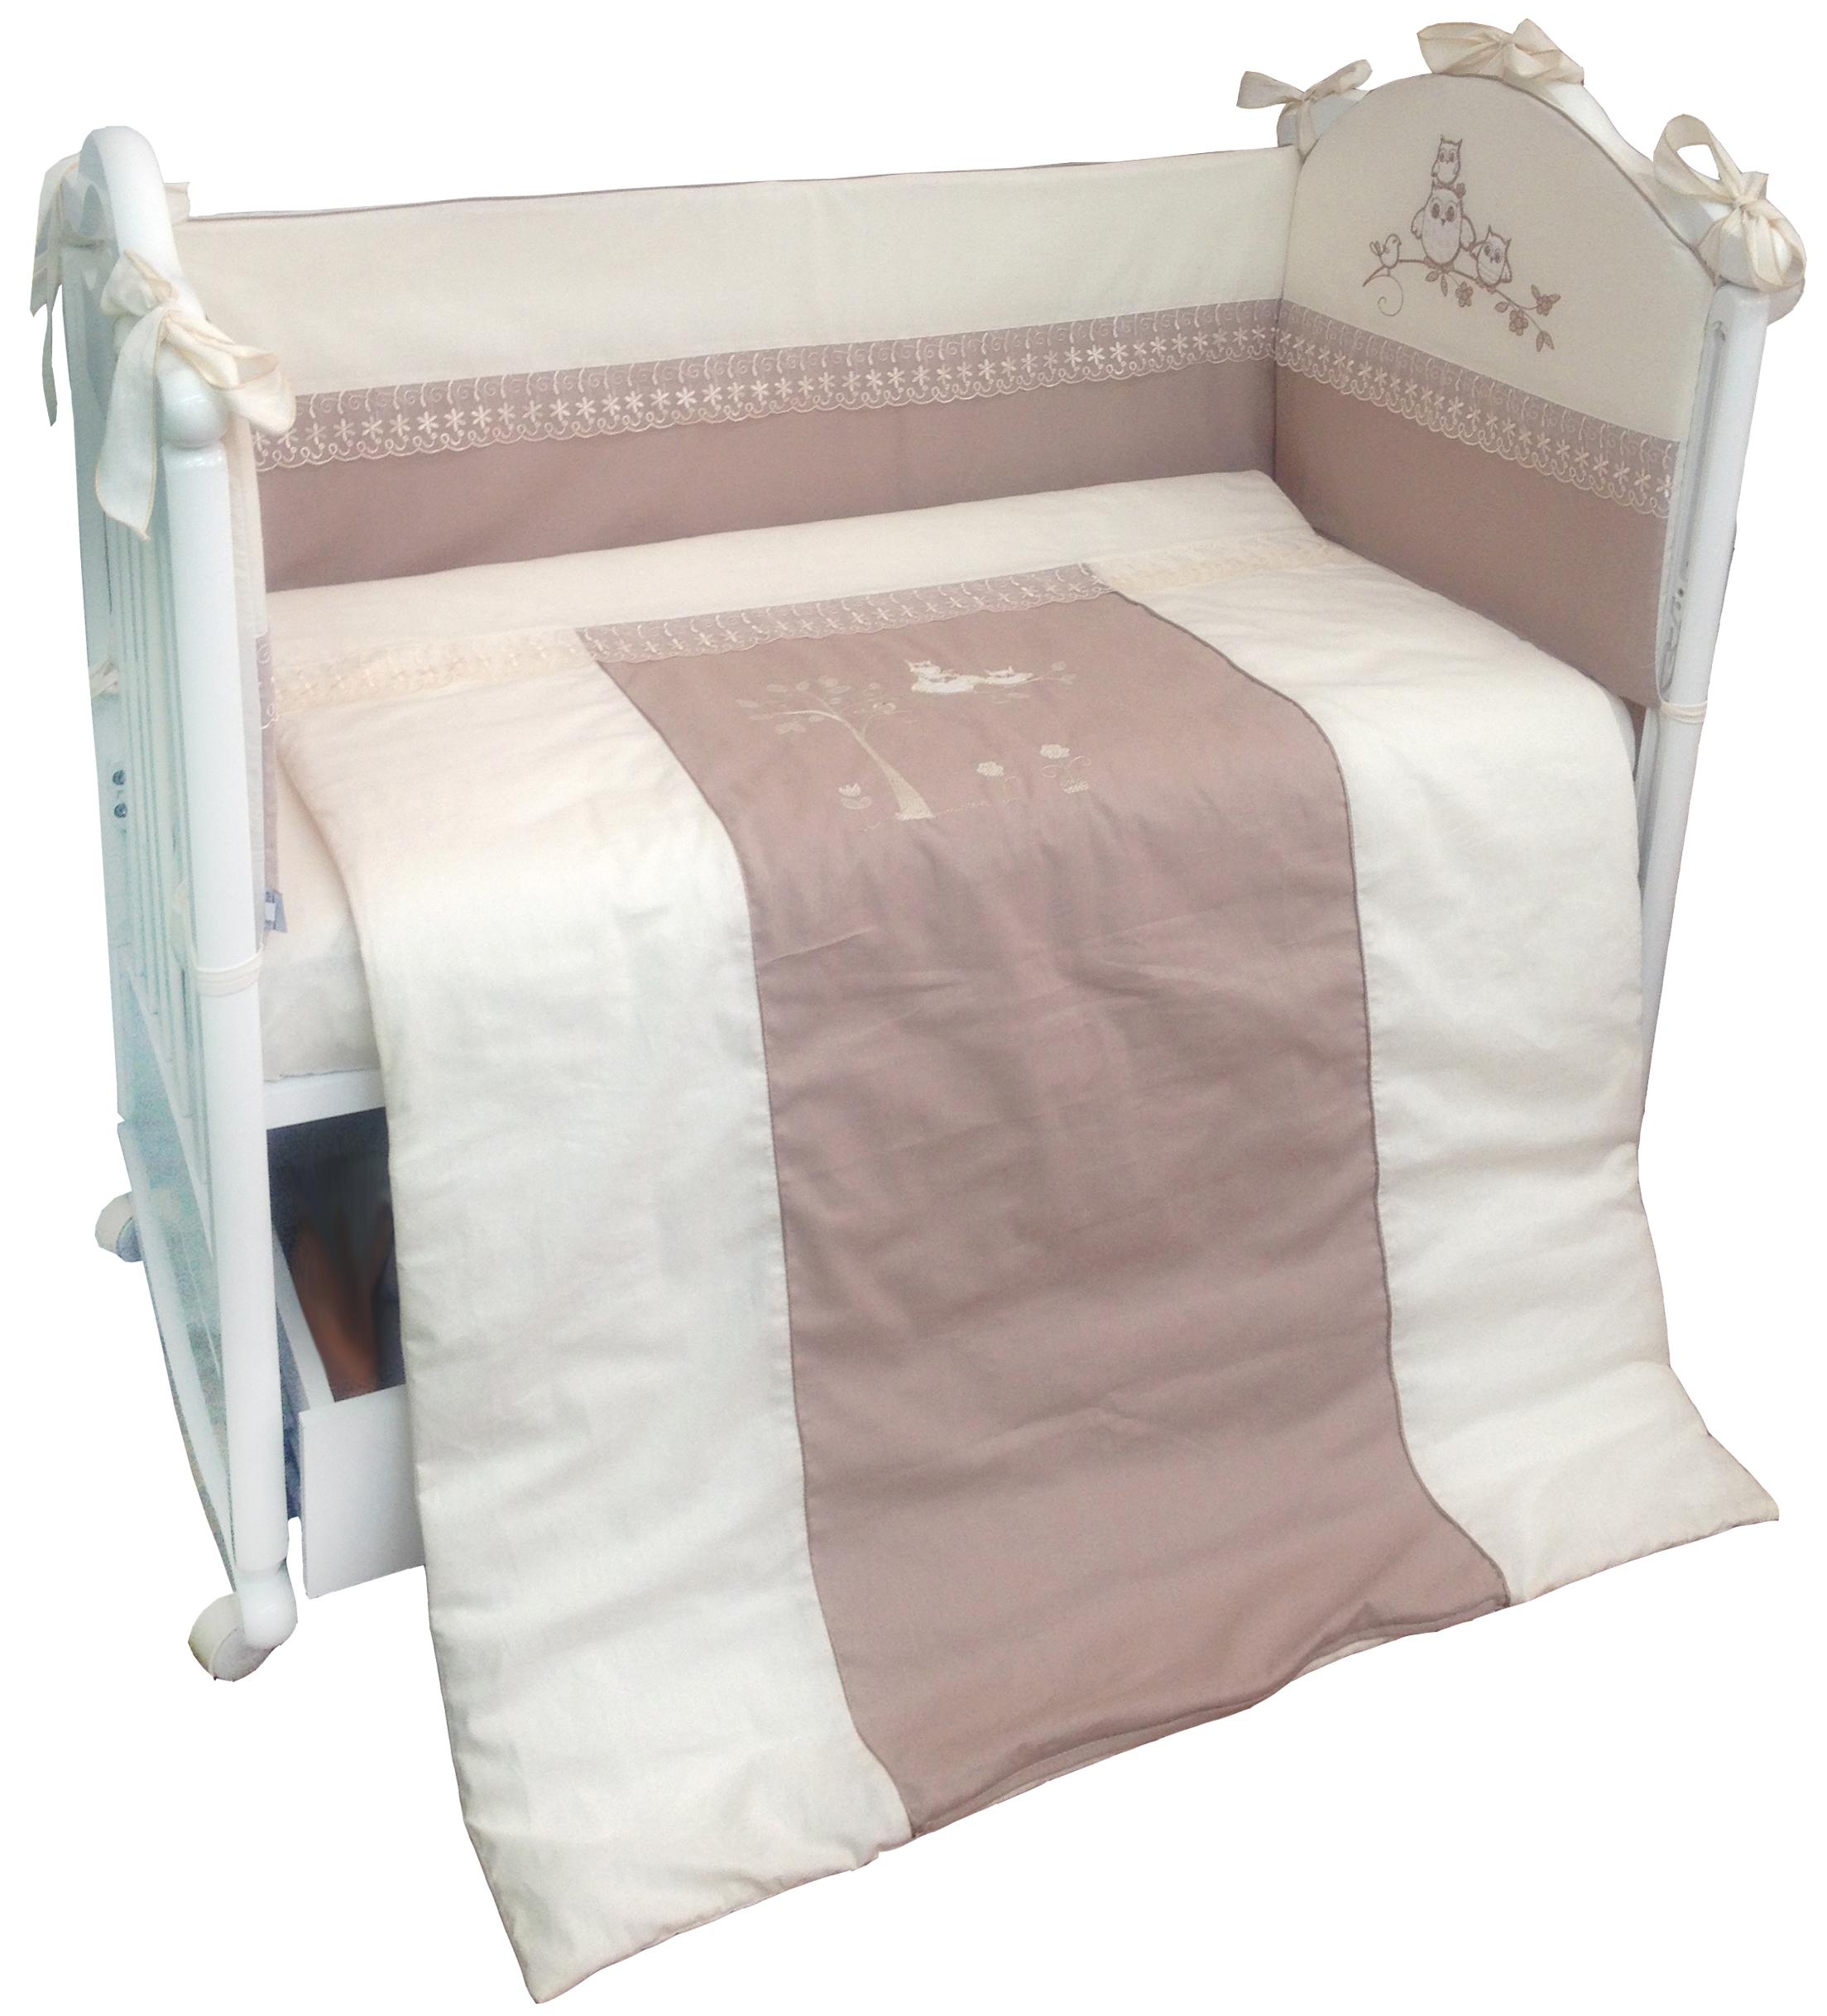 цена Комплект в кроватку L'Abeille Amore онлайн в 2017 году